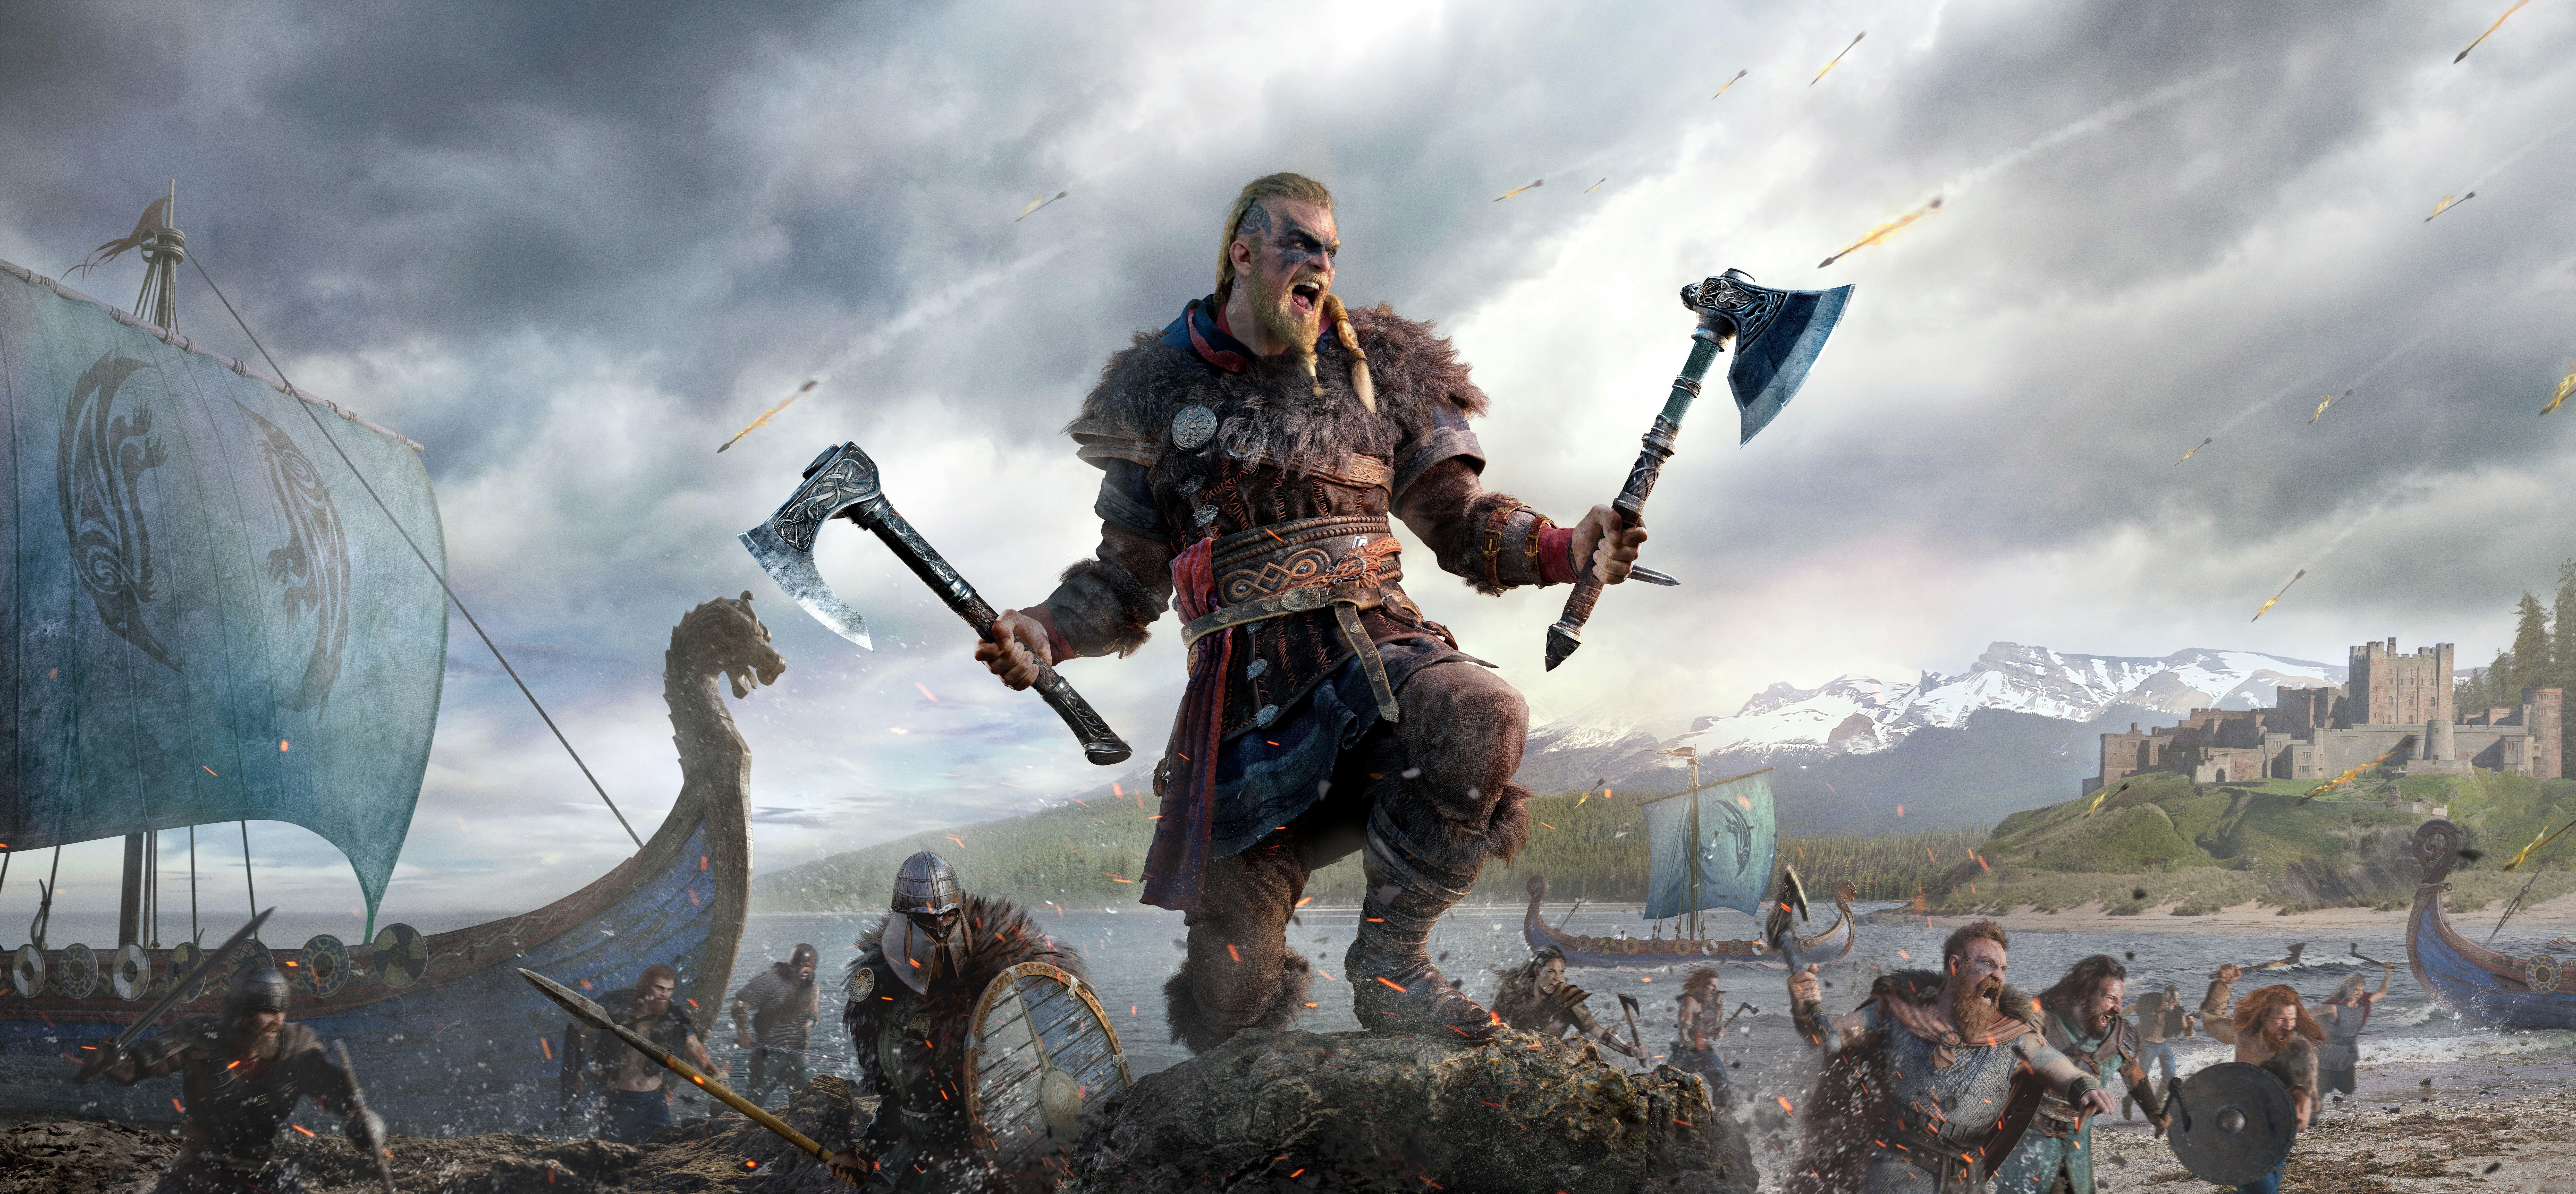 2020 Assassins Creed Valhalla 10K, HD Games, 4k Wallpapers ...